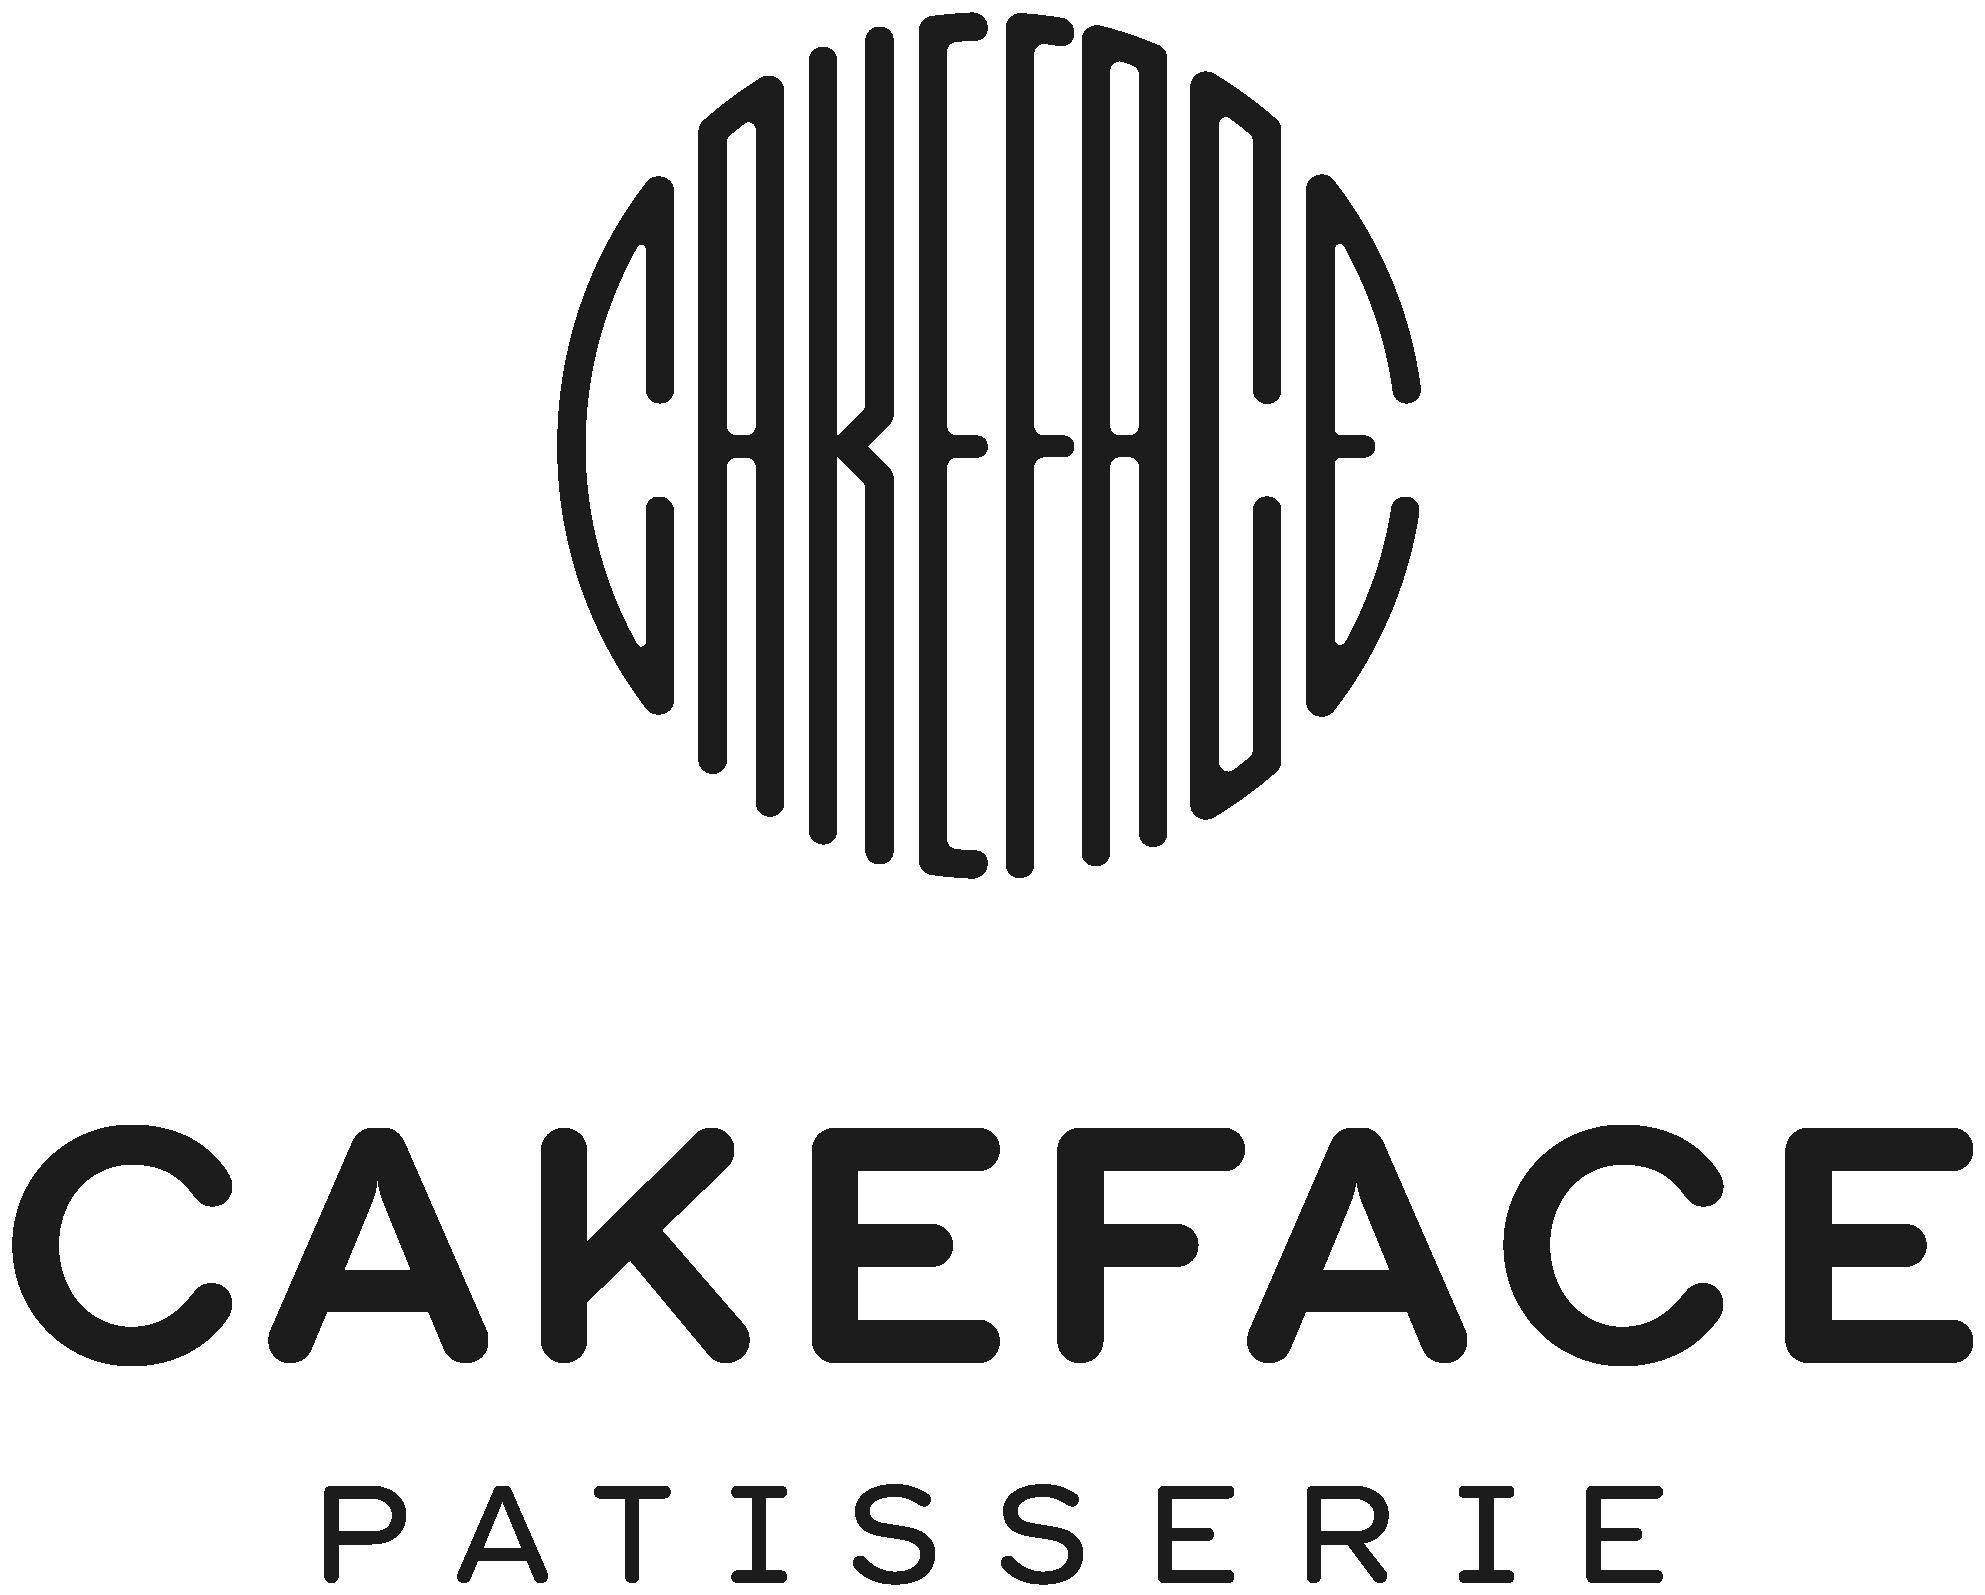 Cakeface Patisserie